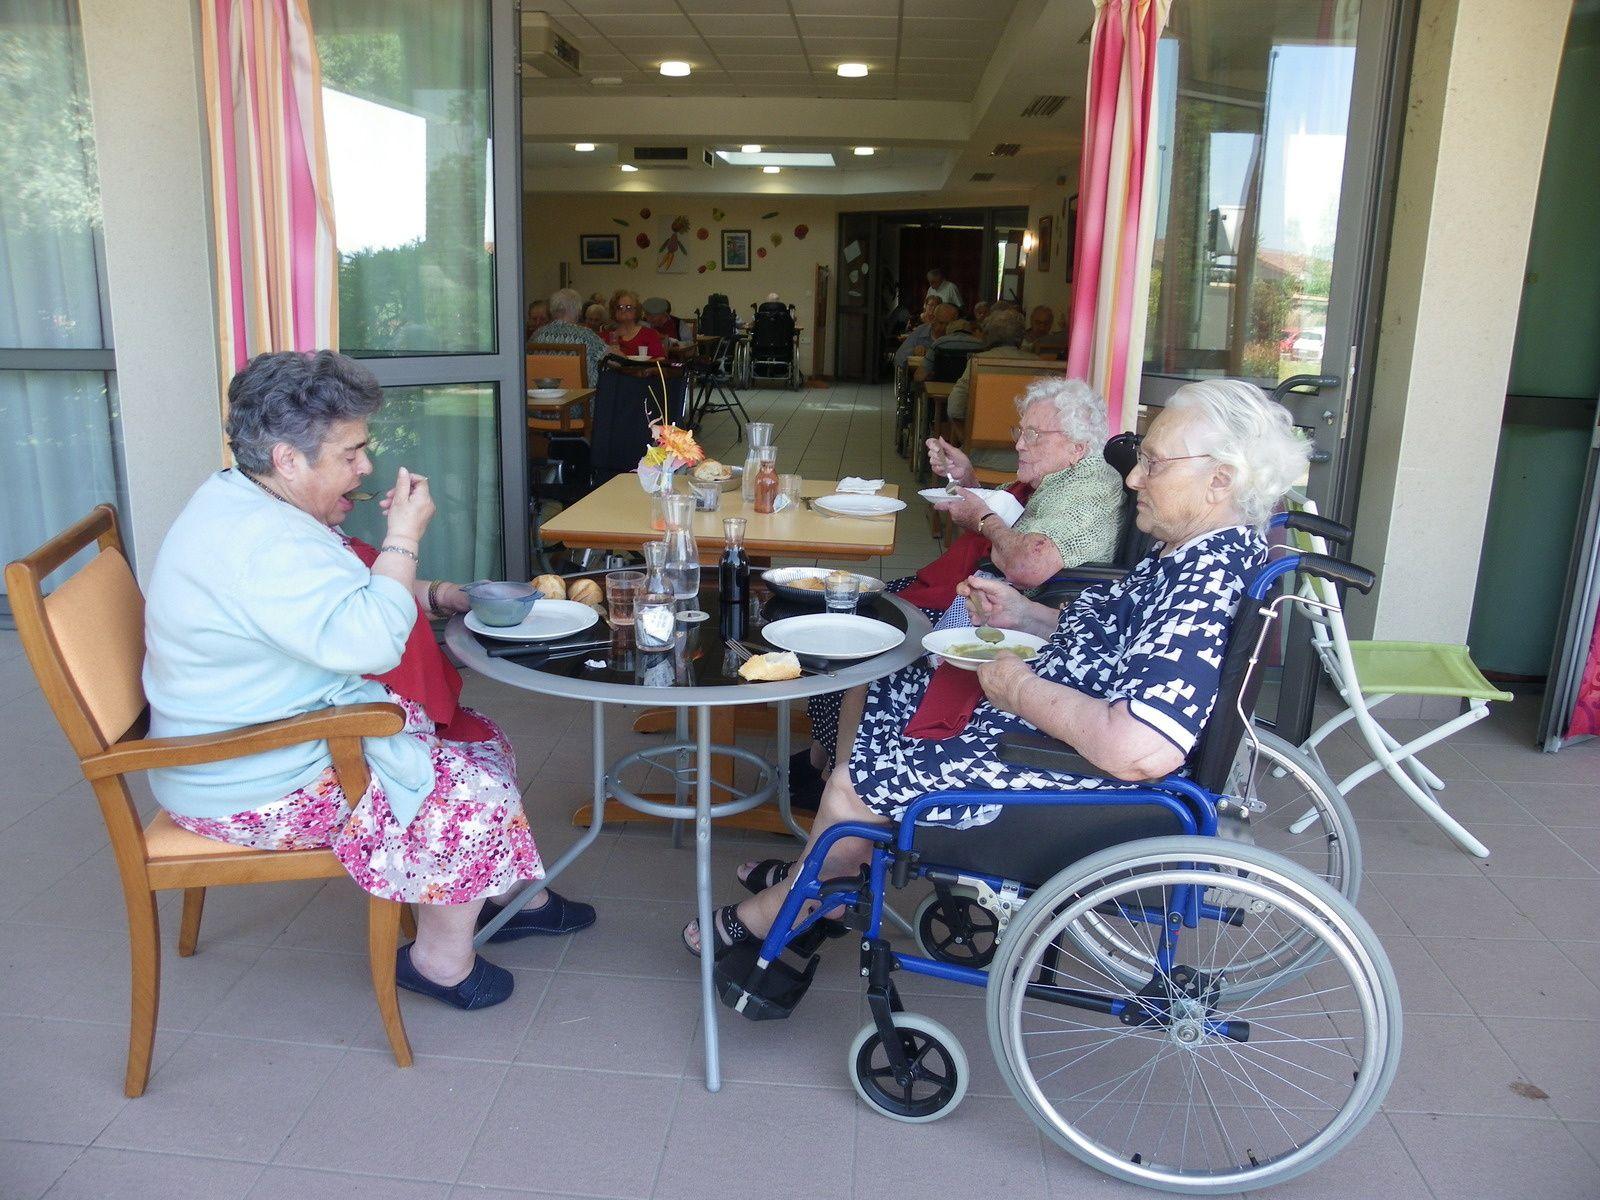 Déjeuner en terrasse!